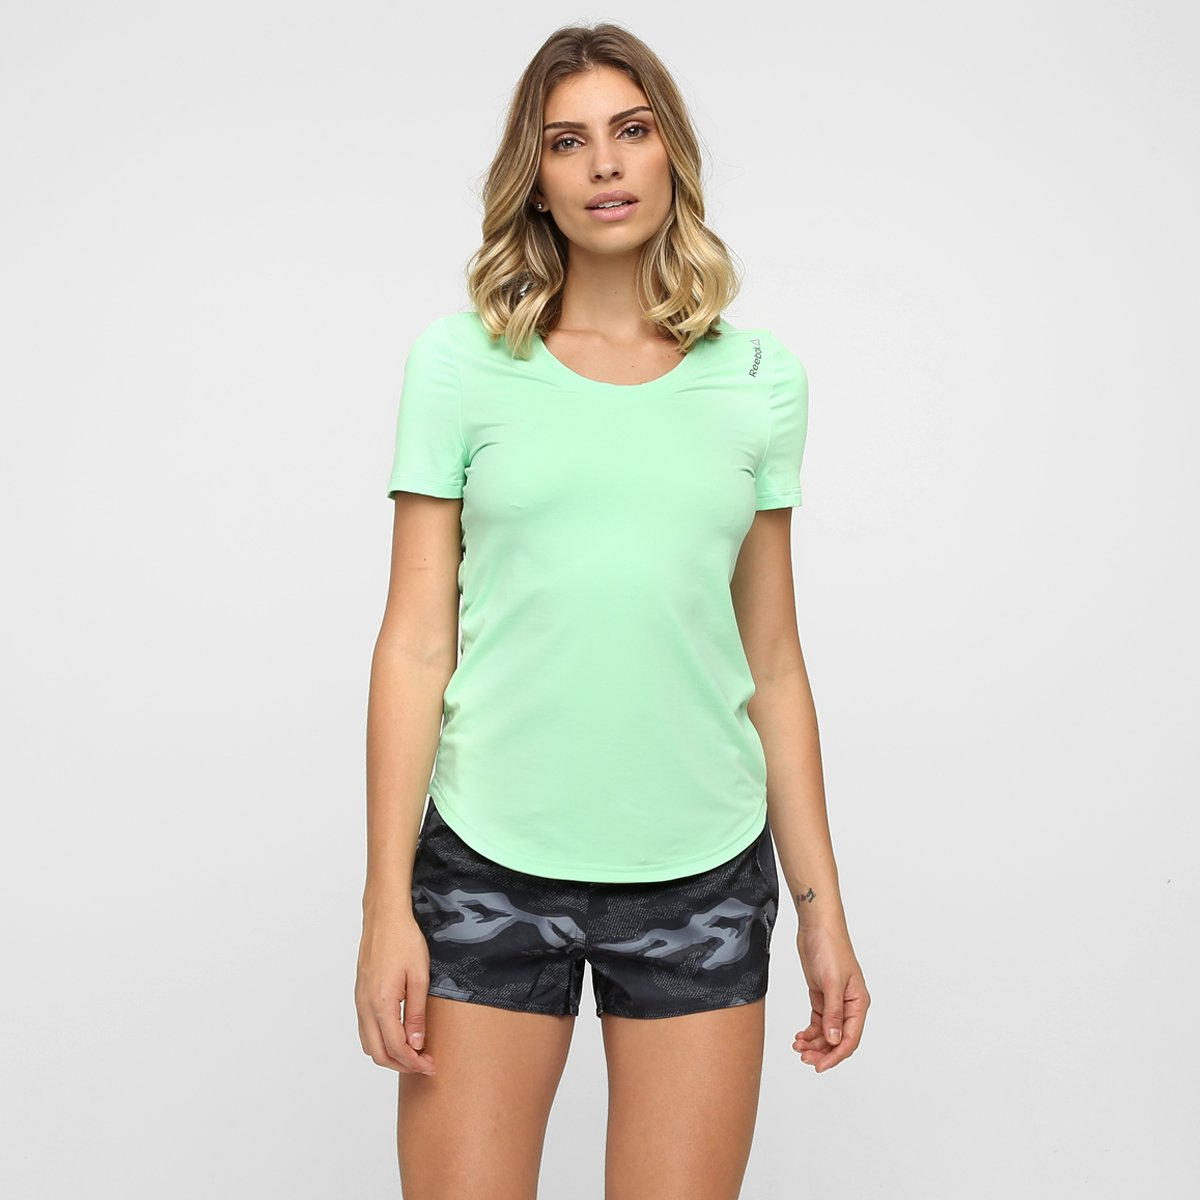 eb93e87ec06 Camiseta Reebok Wor Pd Feminina - Compre Agora